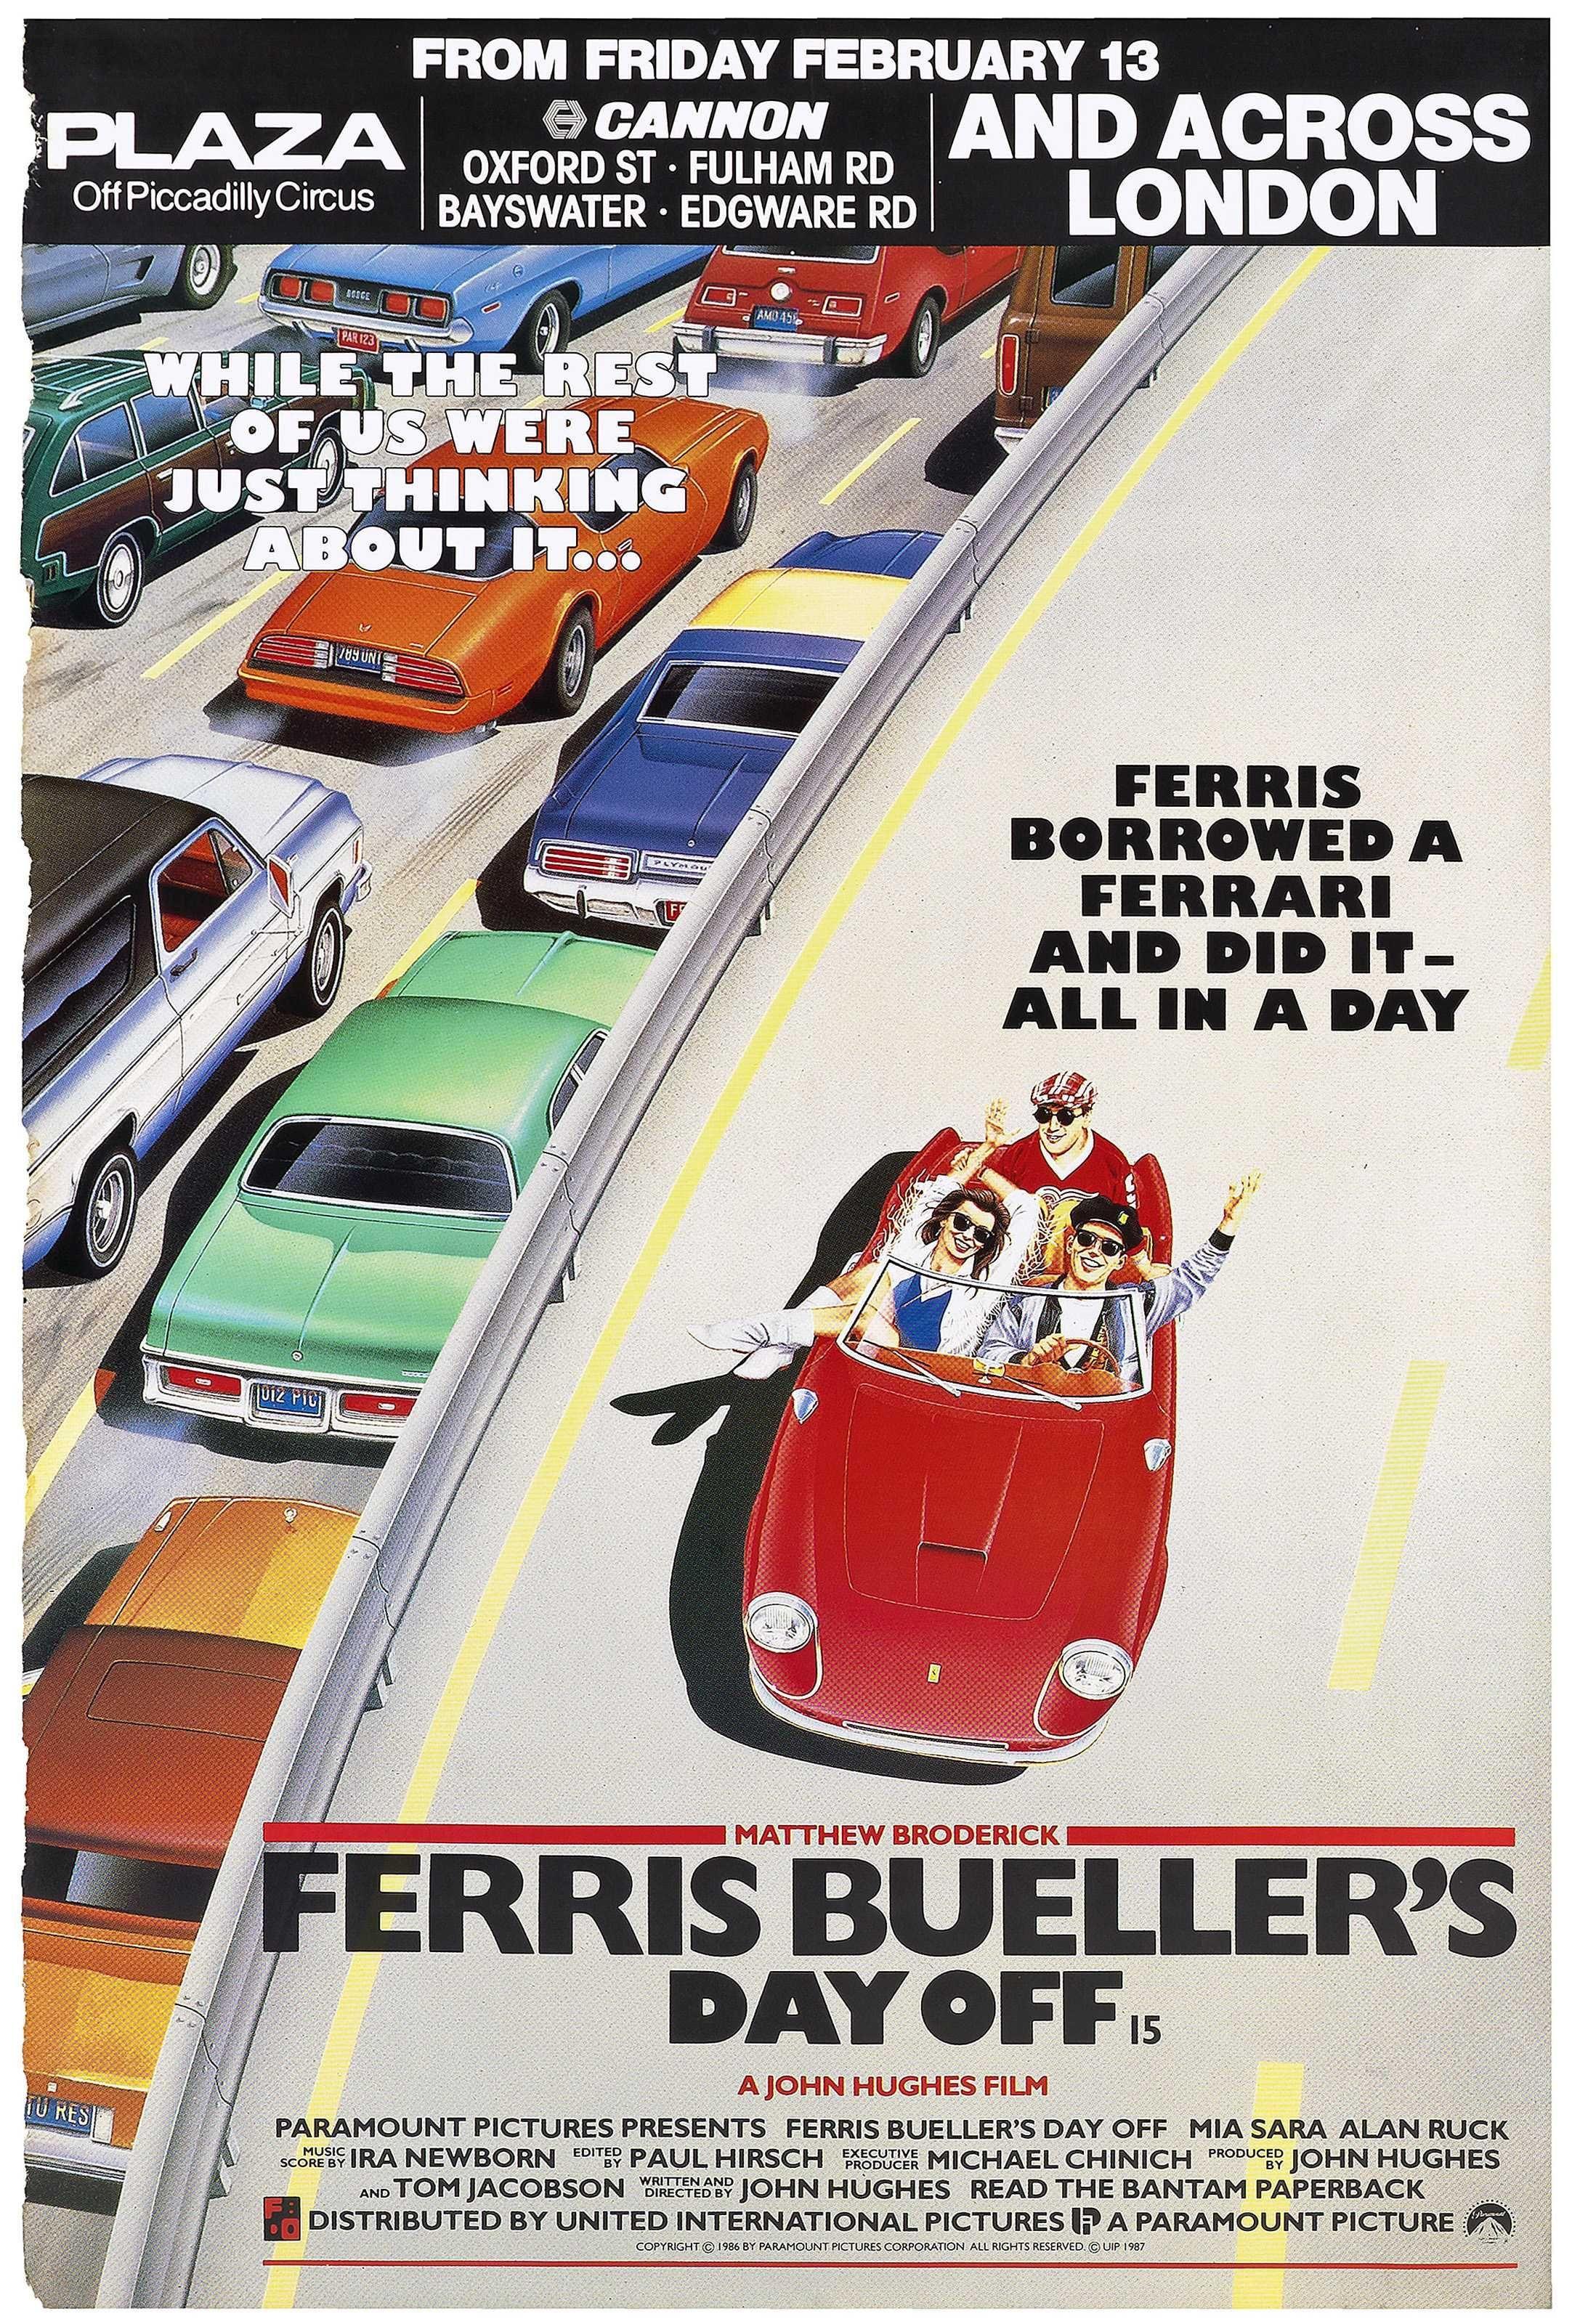 Ferris Bueller S Day Off 1986 2164 X 3200 Hd Wallpaper From